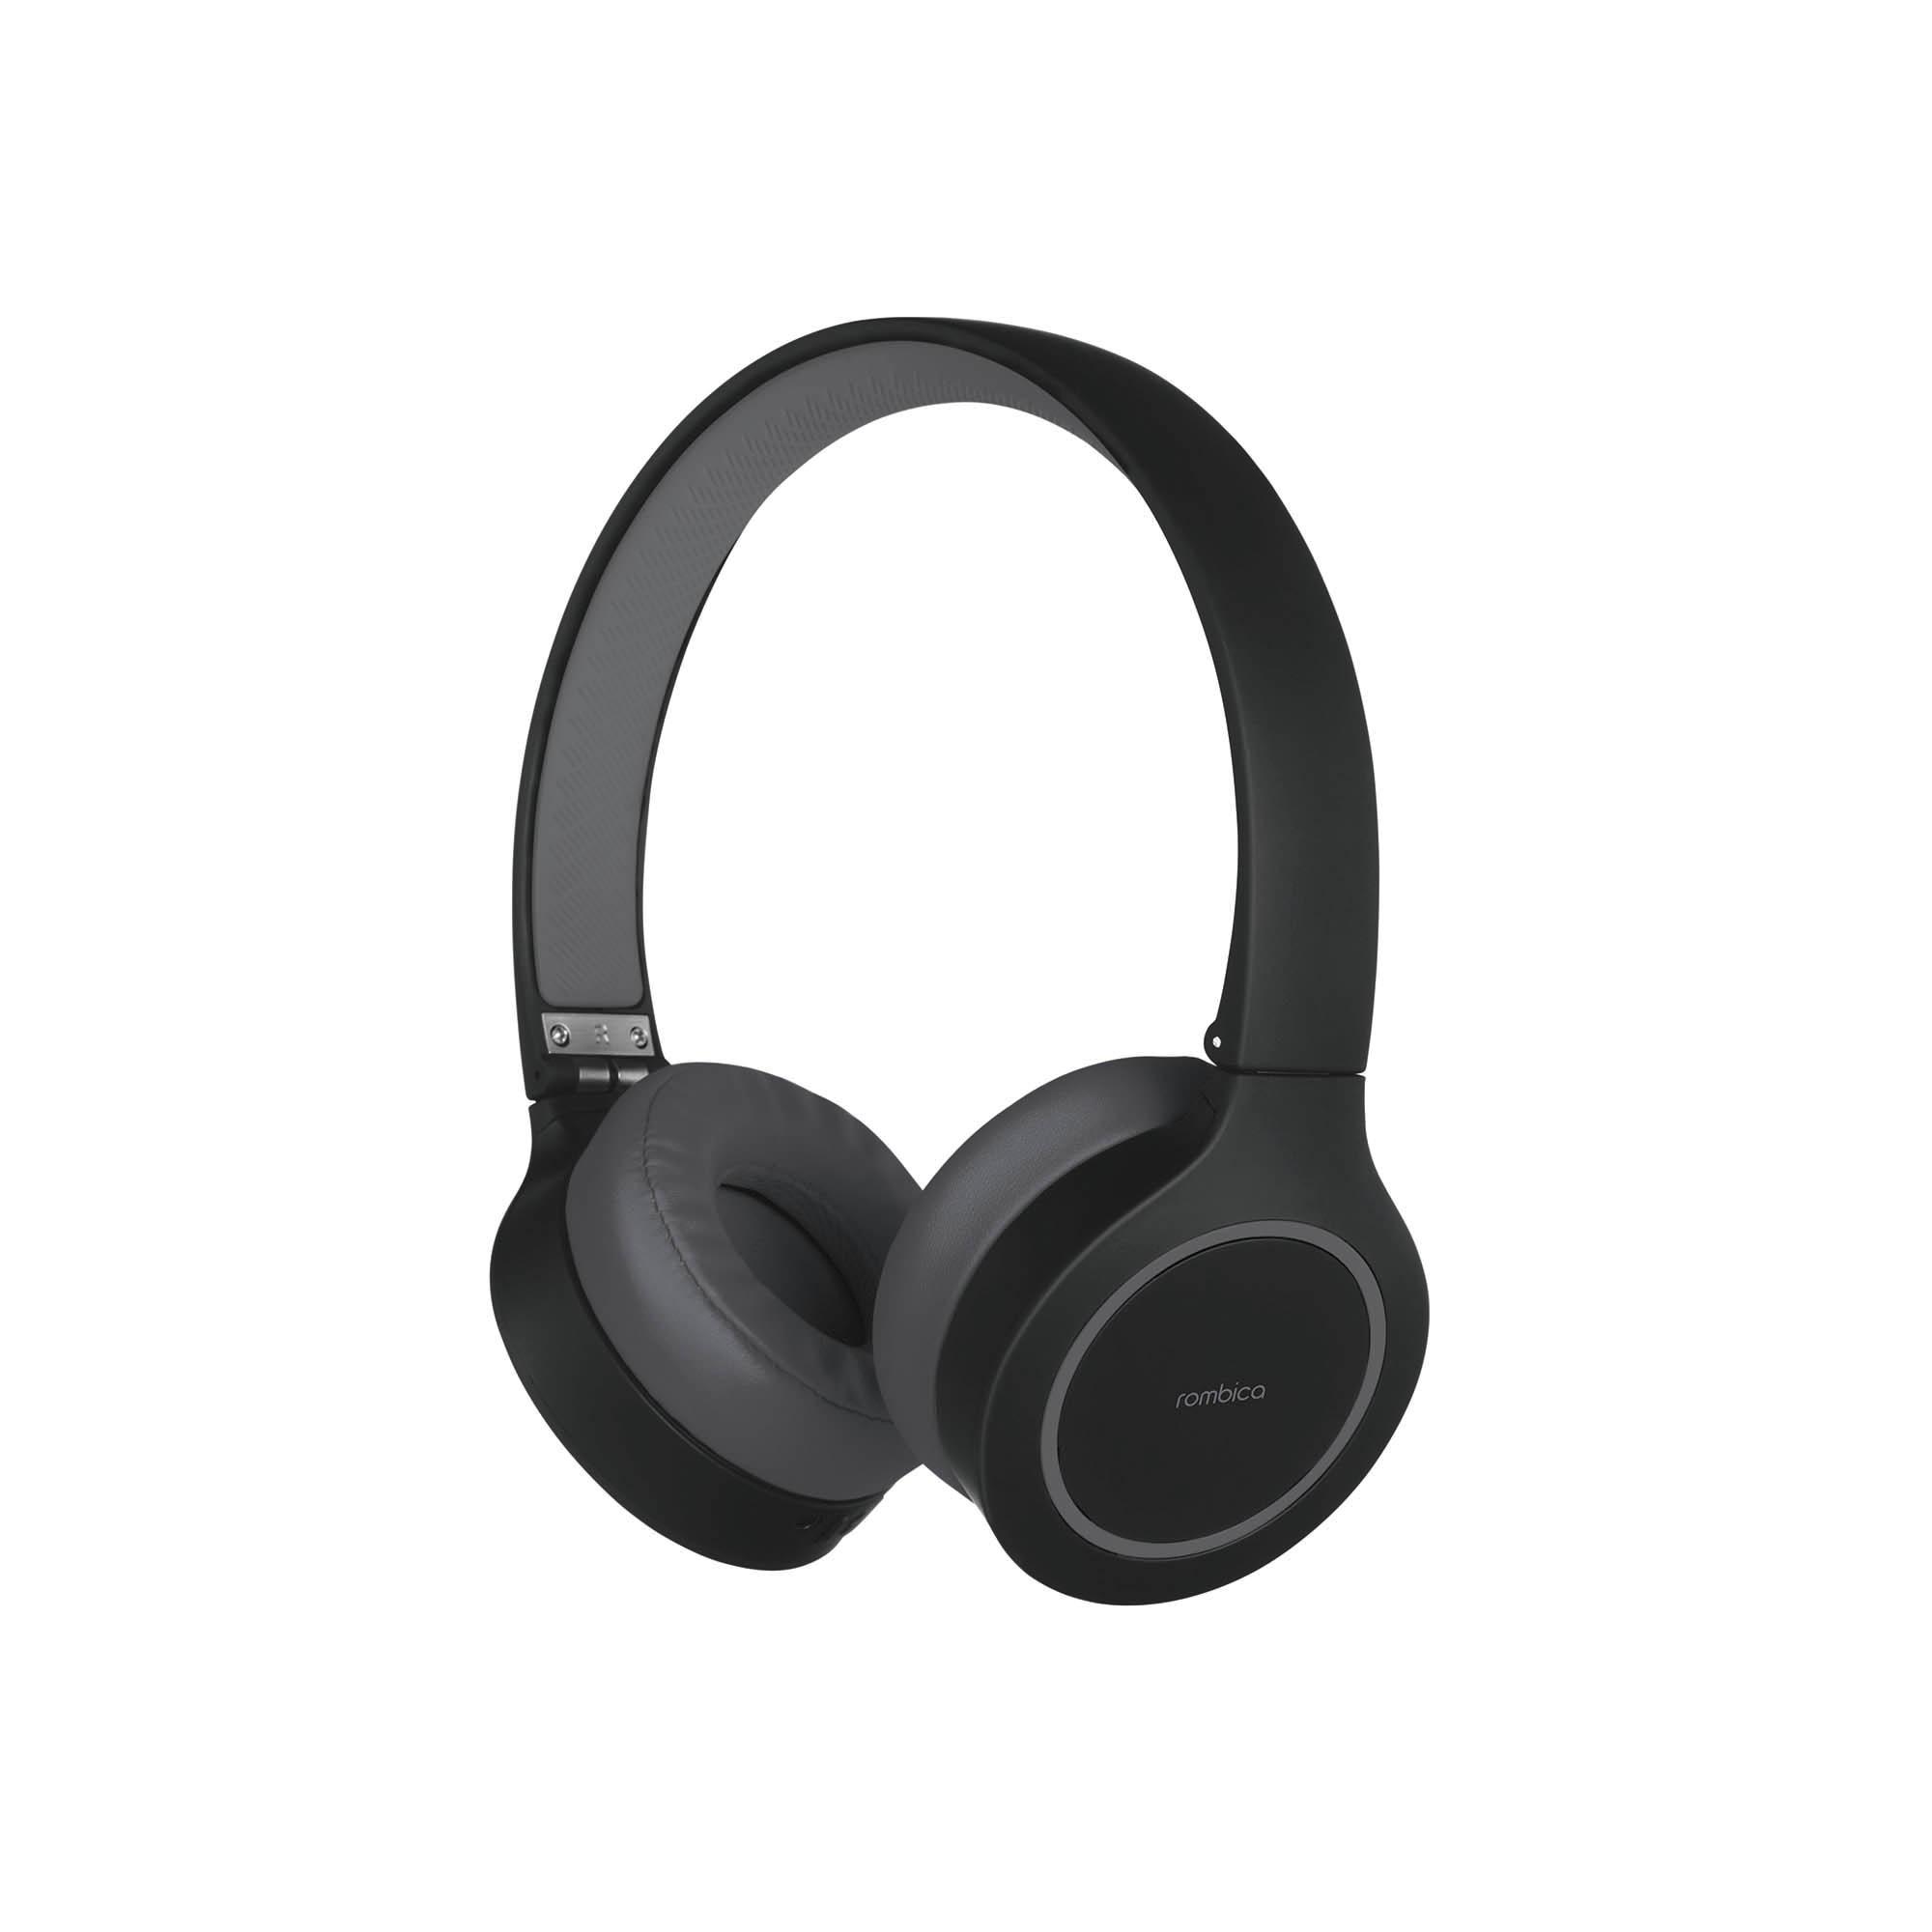 Rombica mysound BH-08 Black